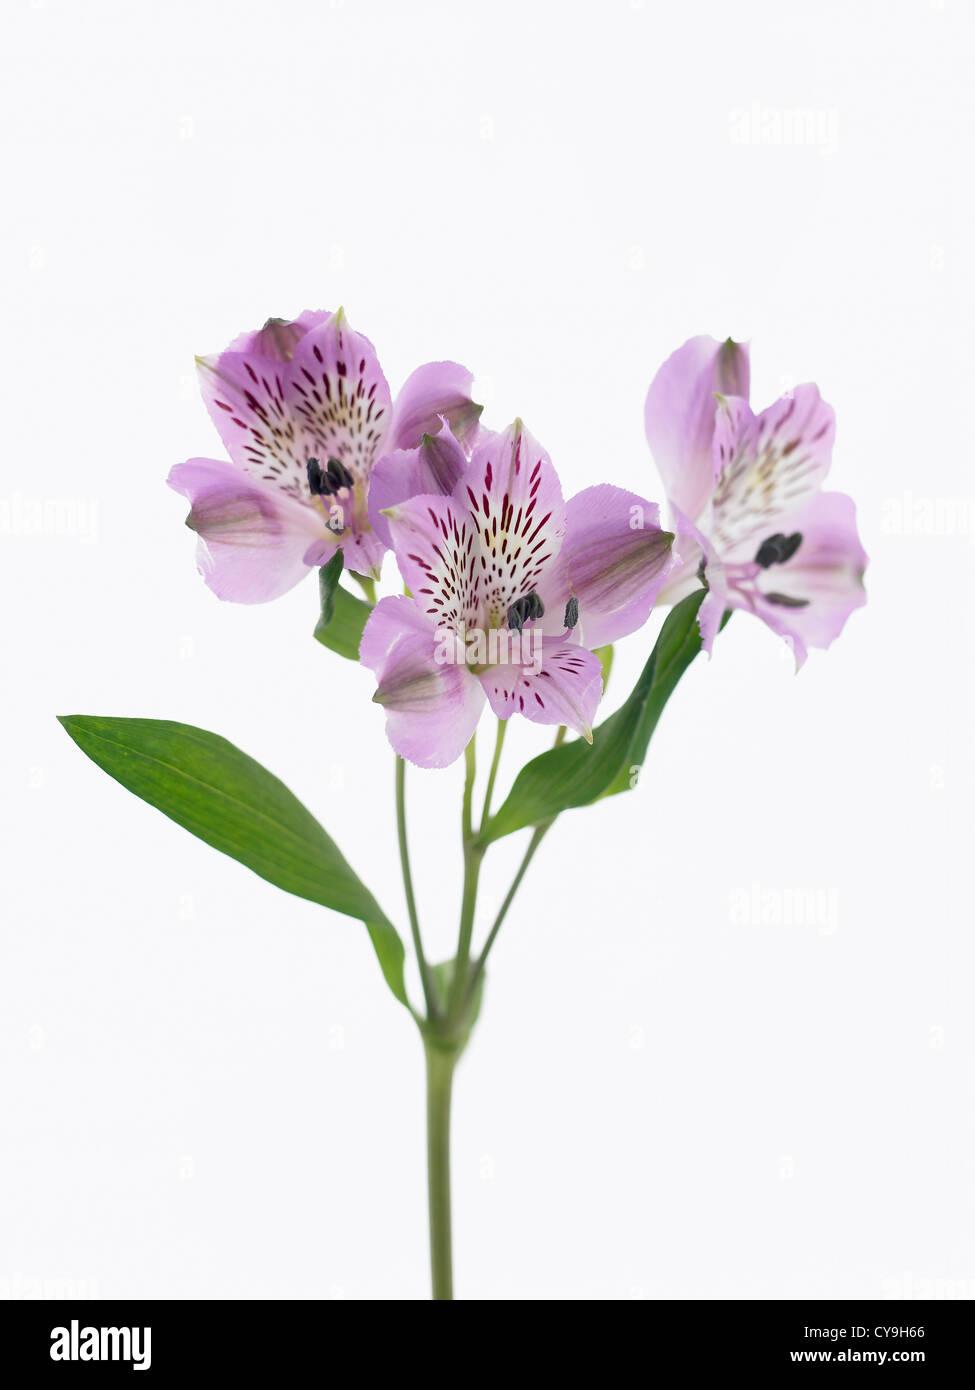 Alstroemeria cultivar, Peruvian lily. Purple flowers on a single stem against a white background. Stock Photo